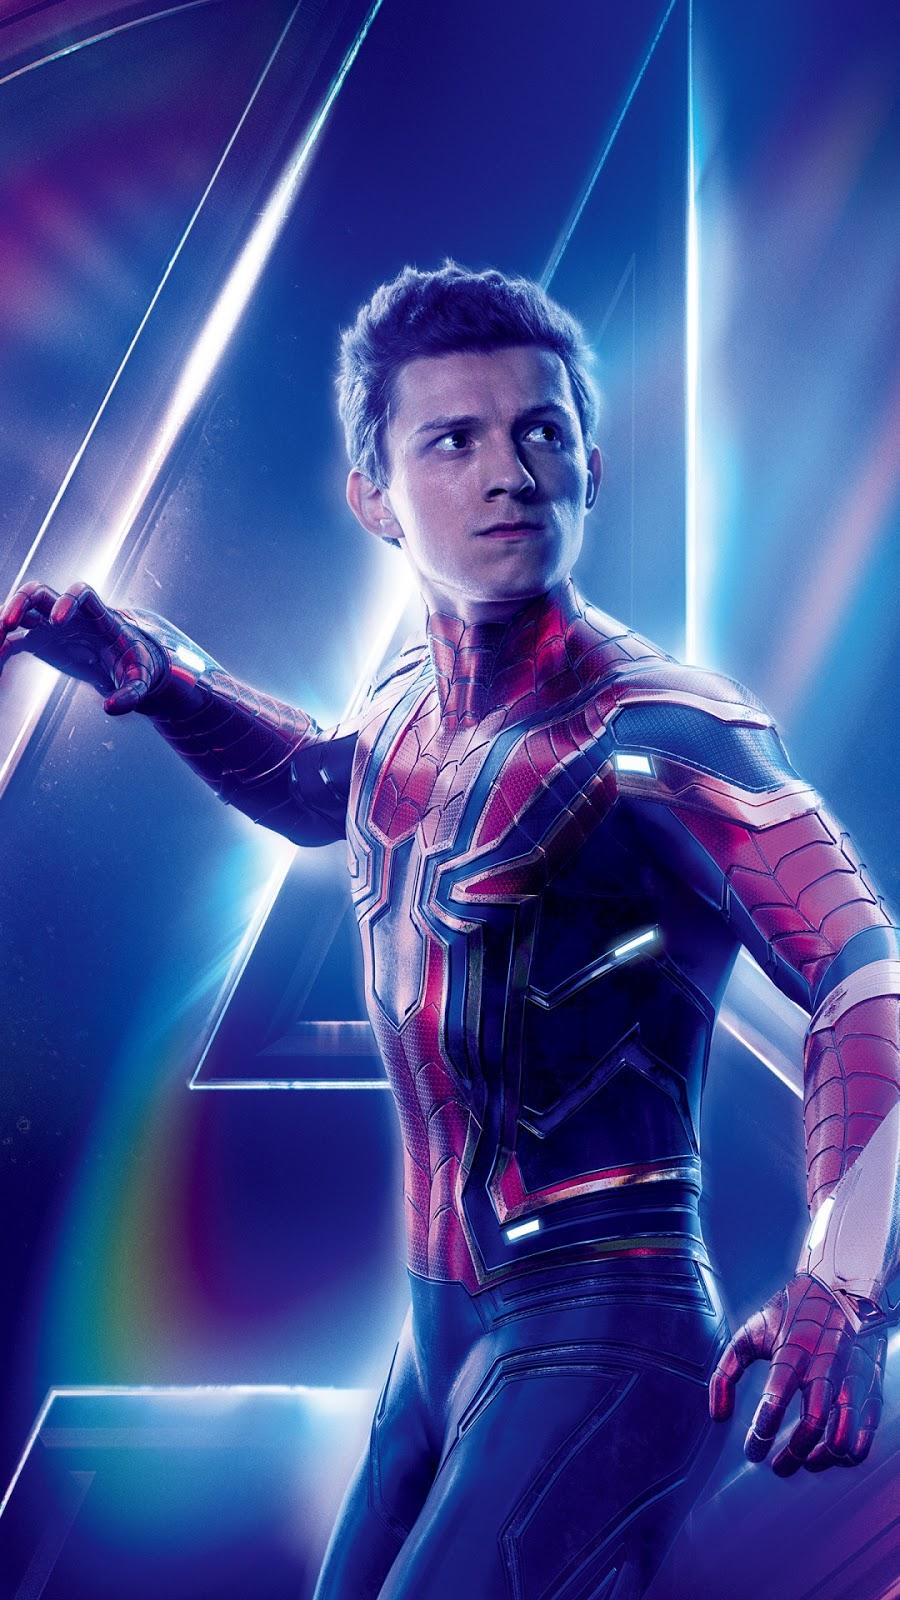 Spider Man Avengers Infinity, Tom Holland, Vingadores: Guerra Infinita para PC, Notebook, iPhone, Android e Tablet.